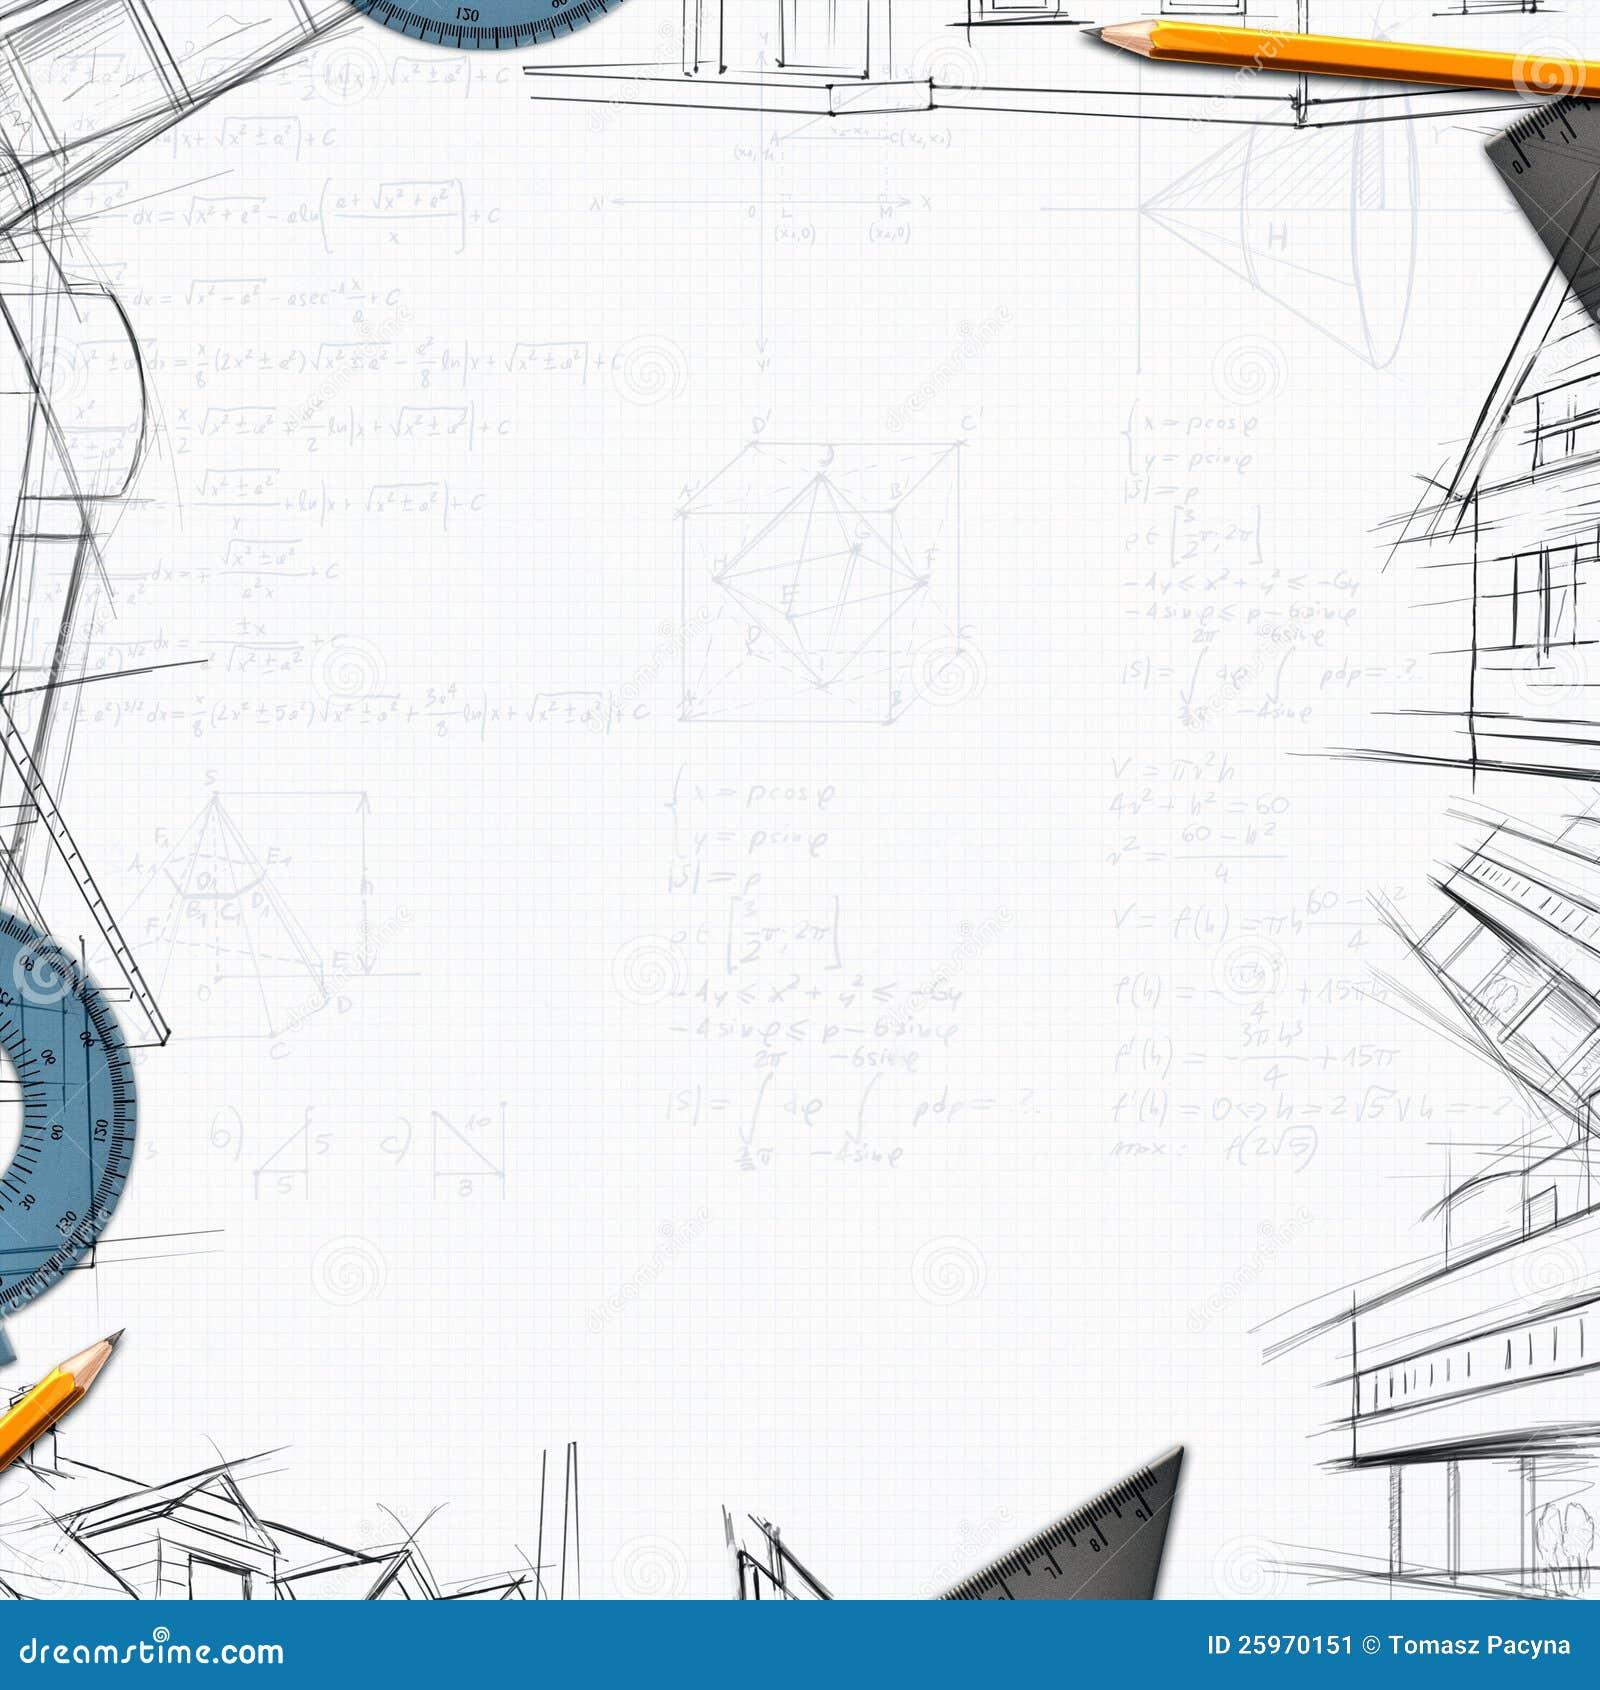 Architect constructor designer background stock image for Designer or architect